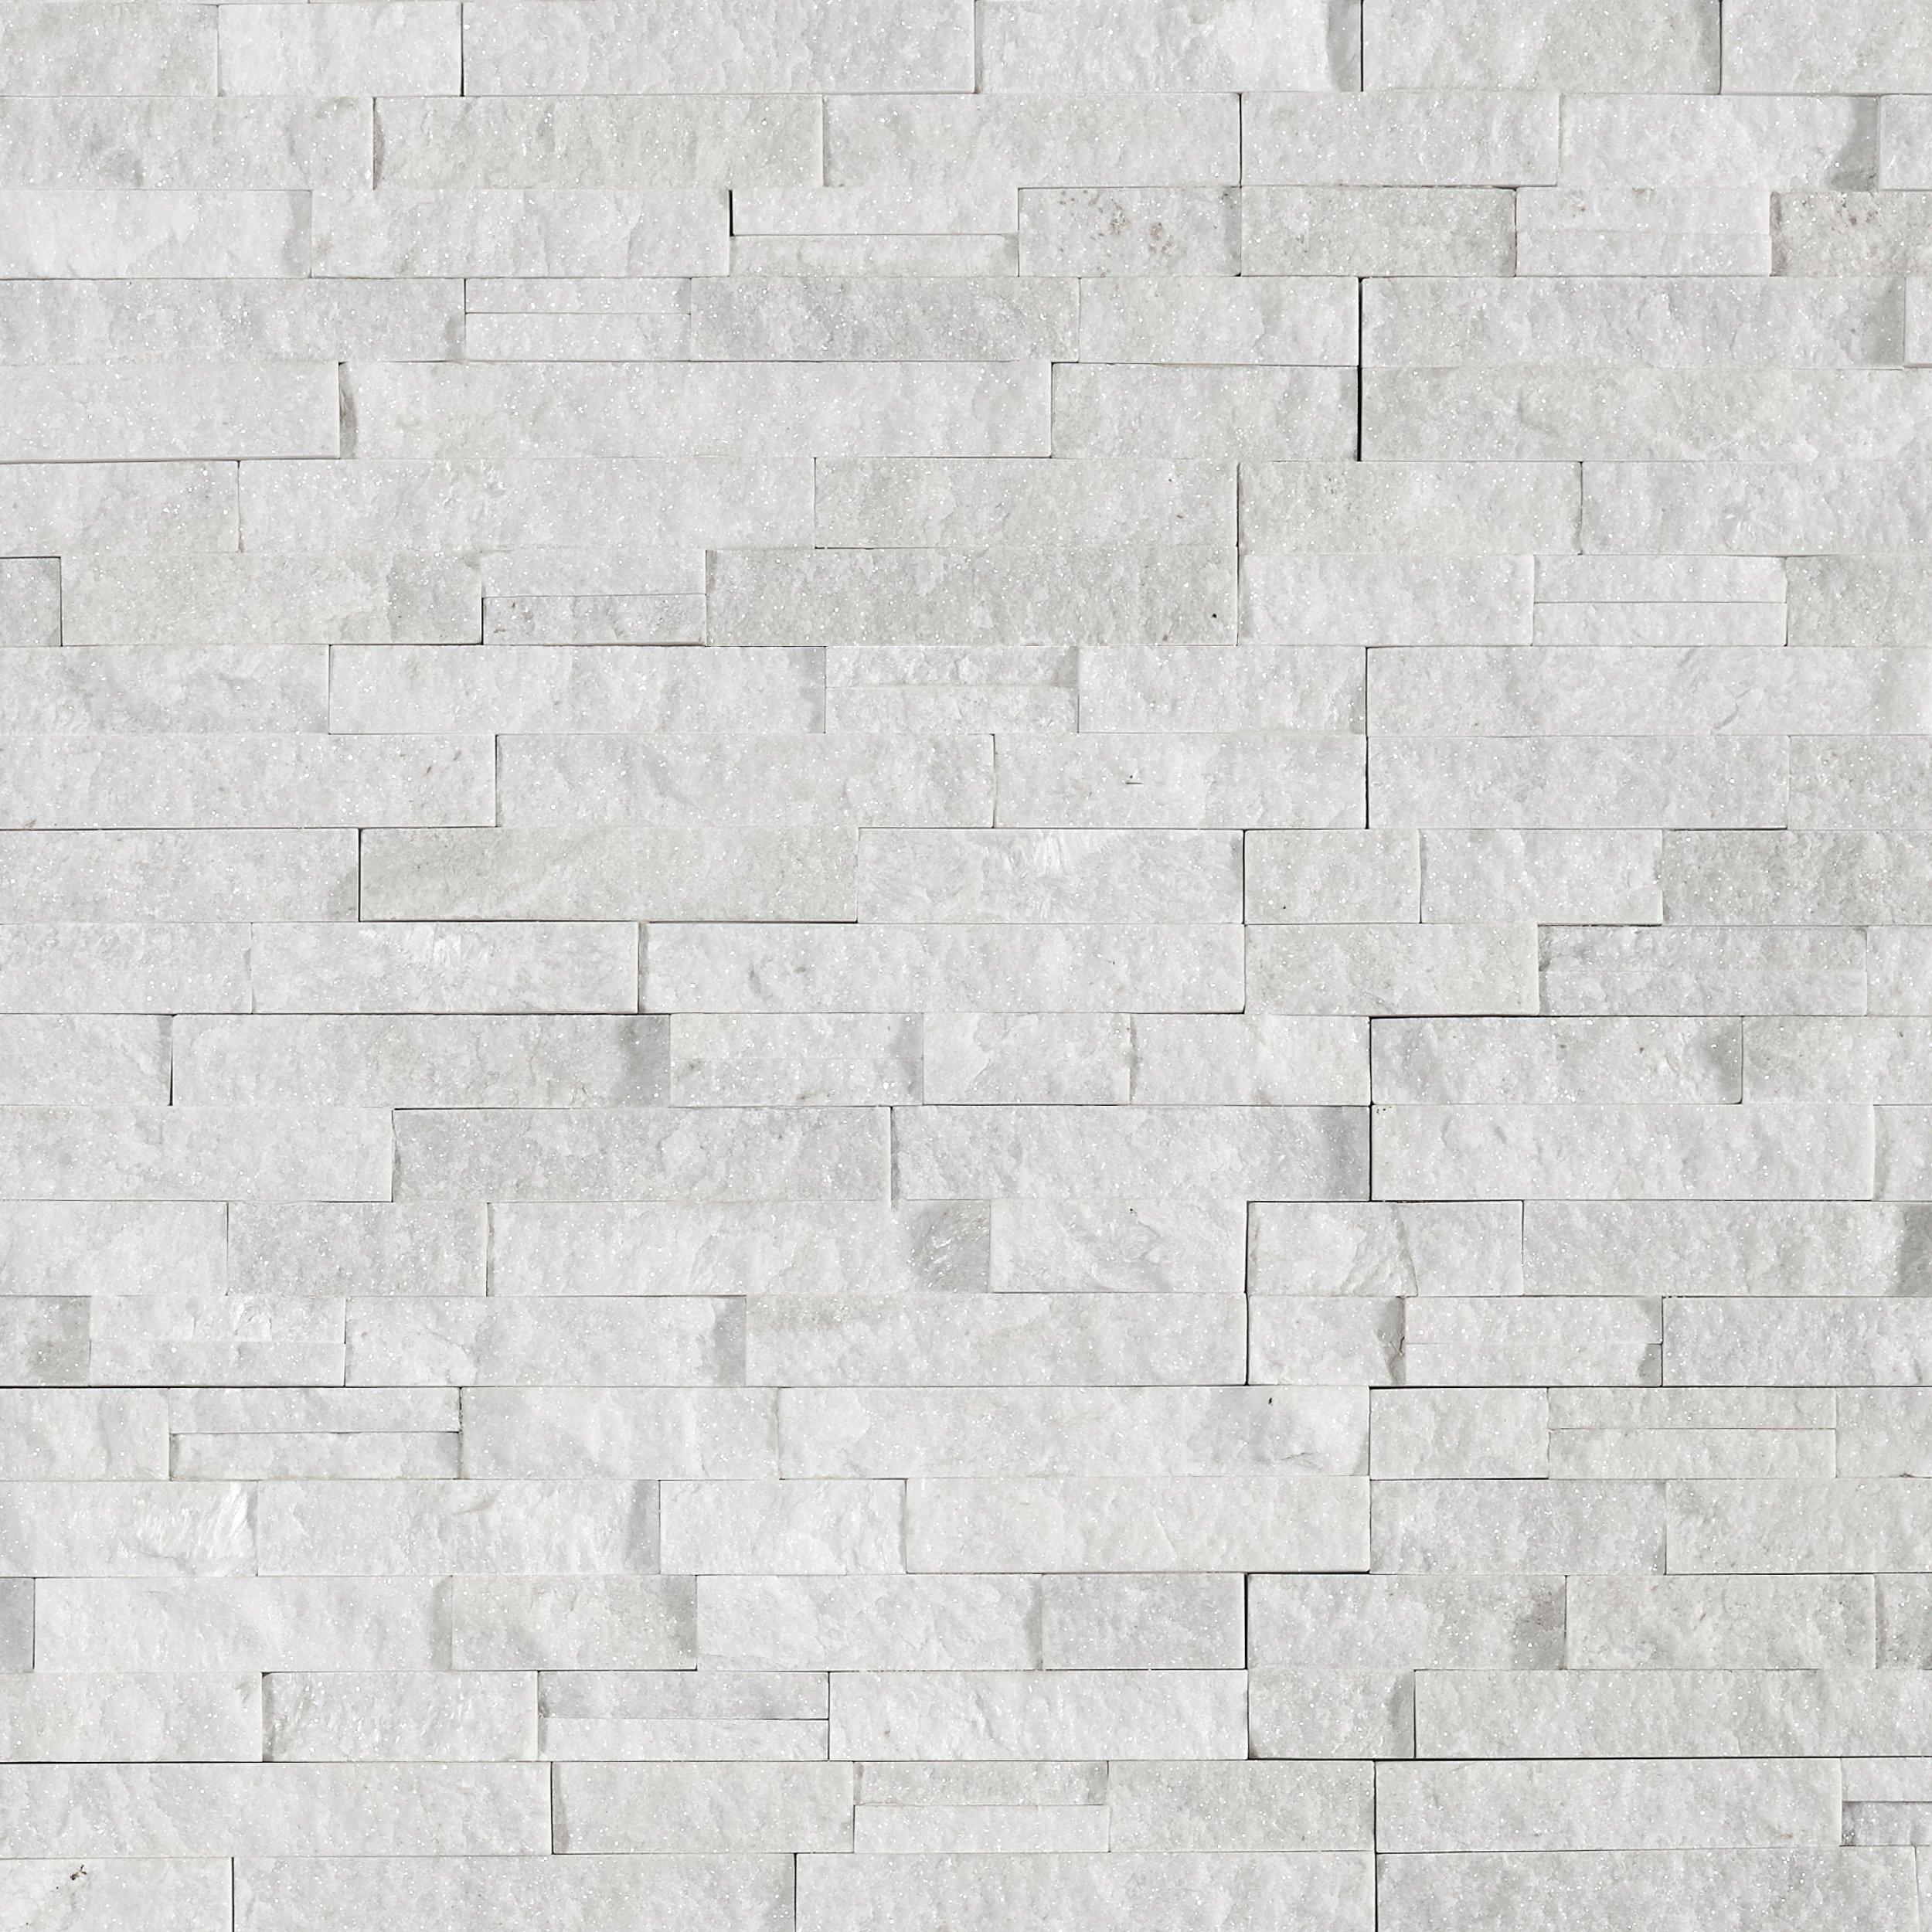 Glacier Splitface Quartzite Panel Ledger In